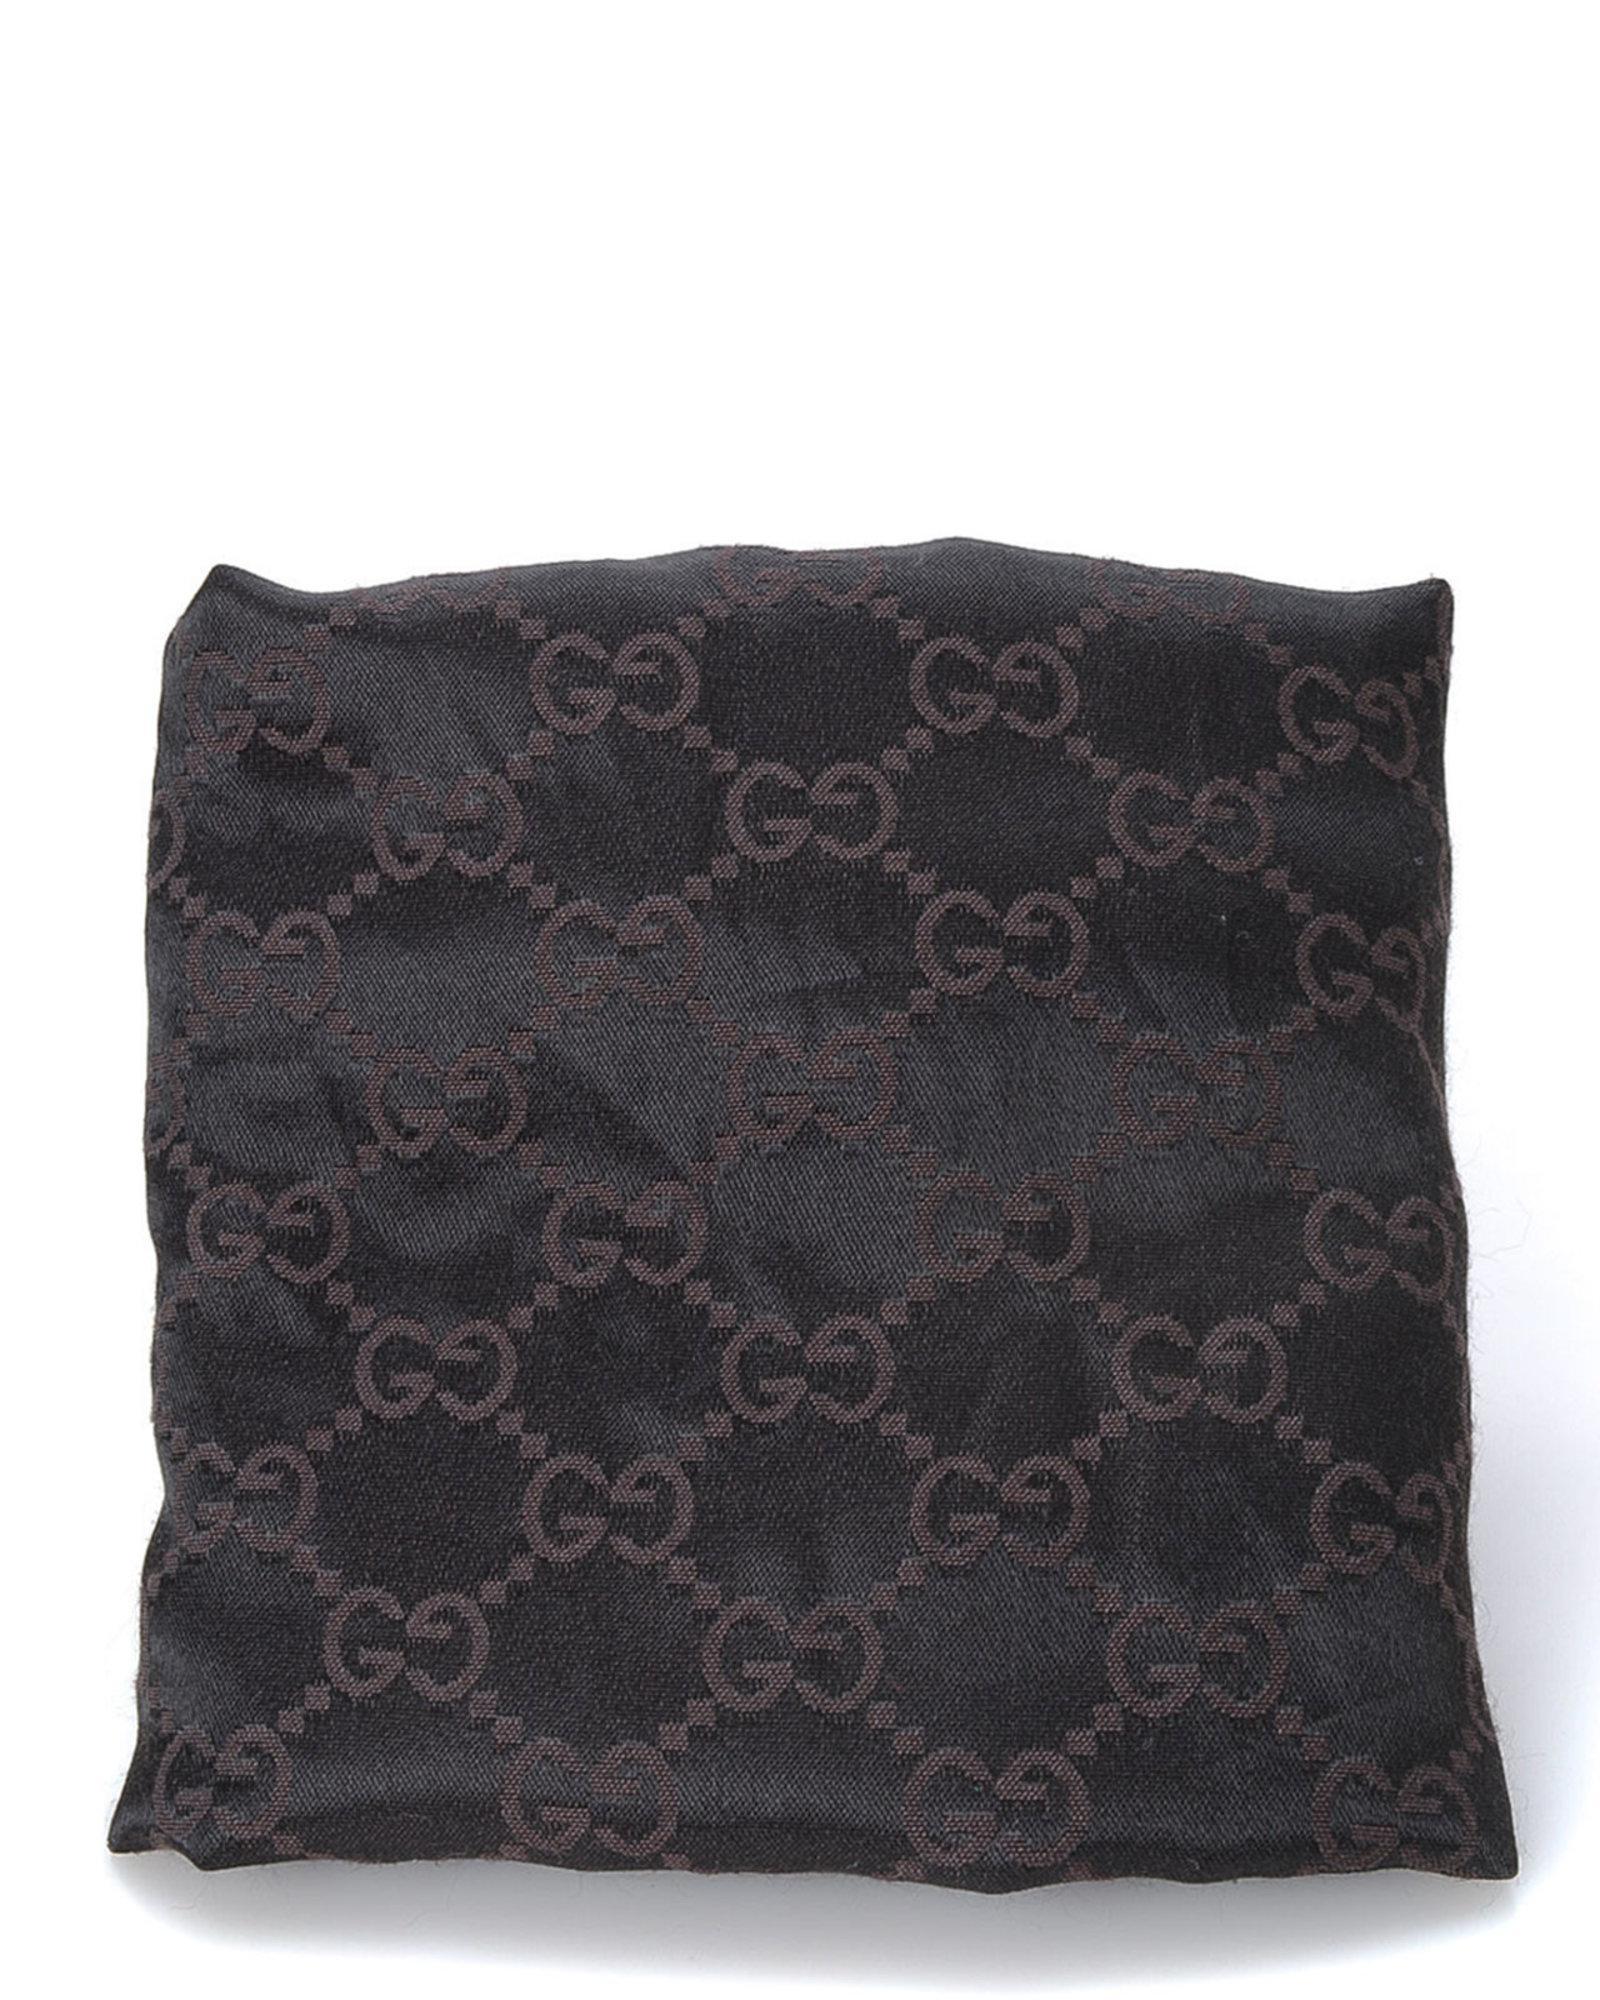 df4dbb2580 Lyst - Gucci Canvas Tote Bag - Vintage in Black